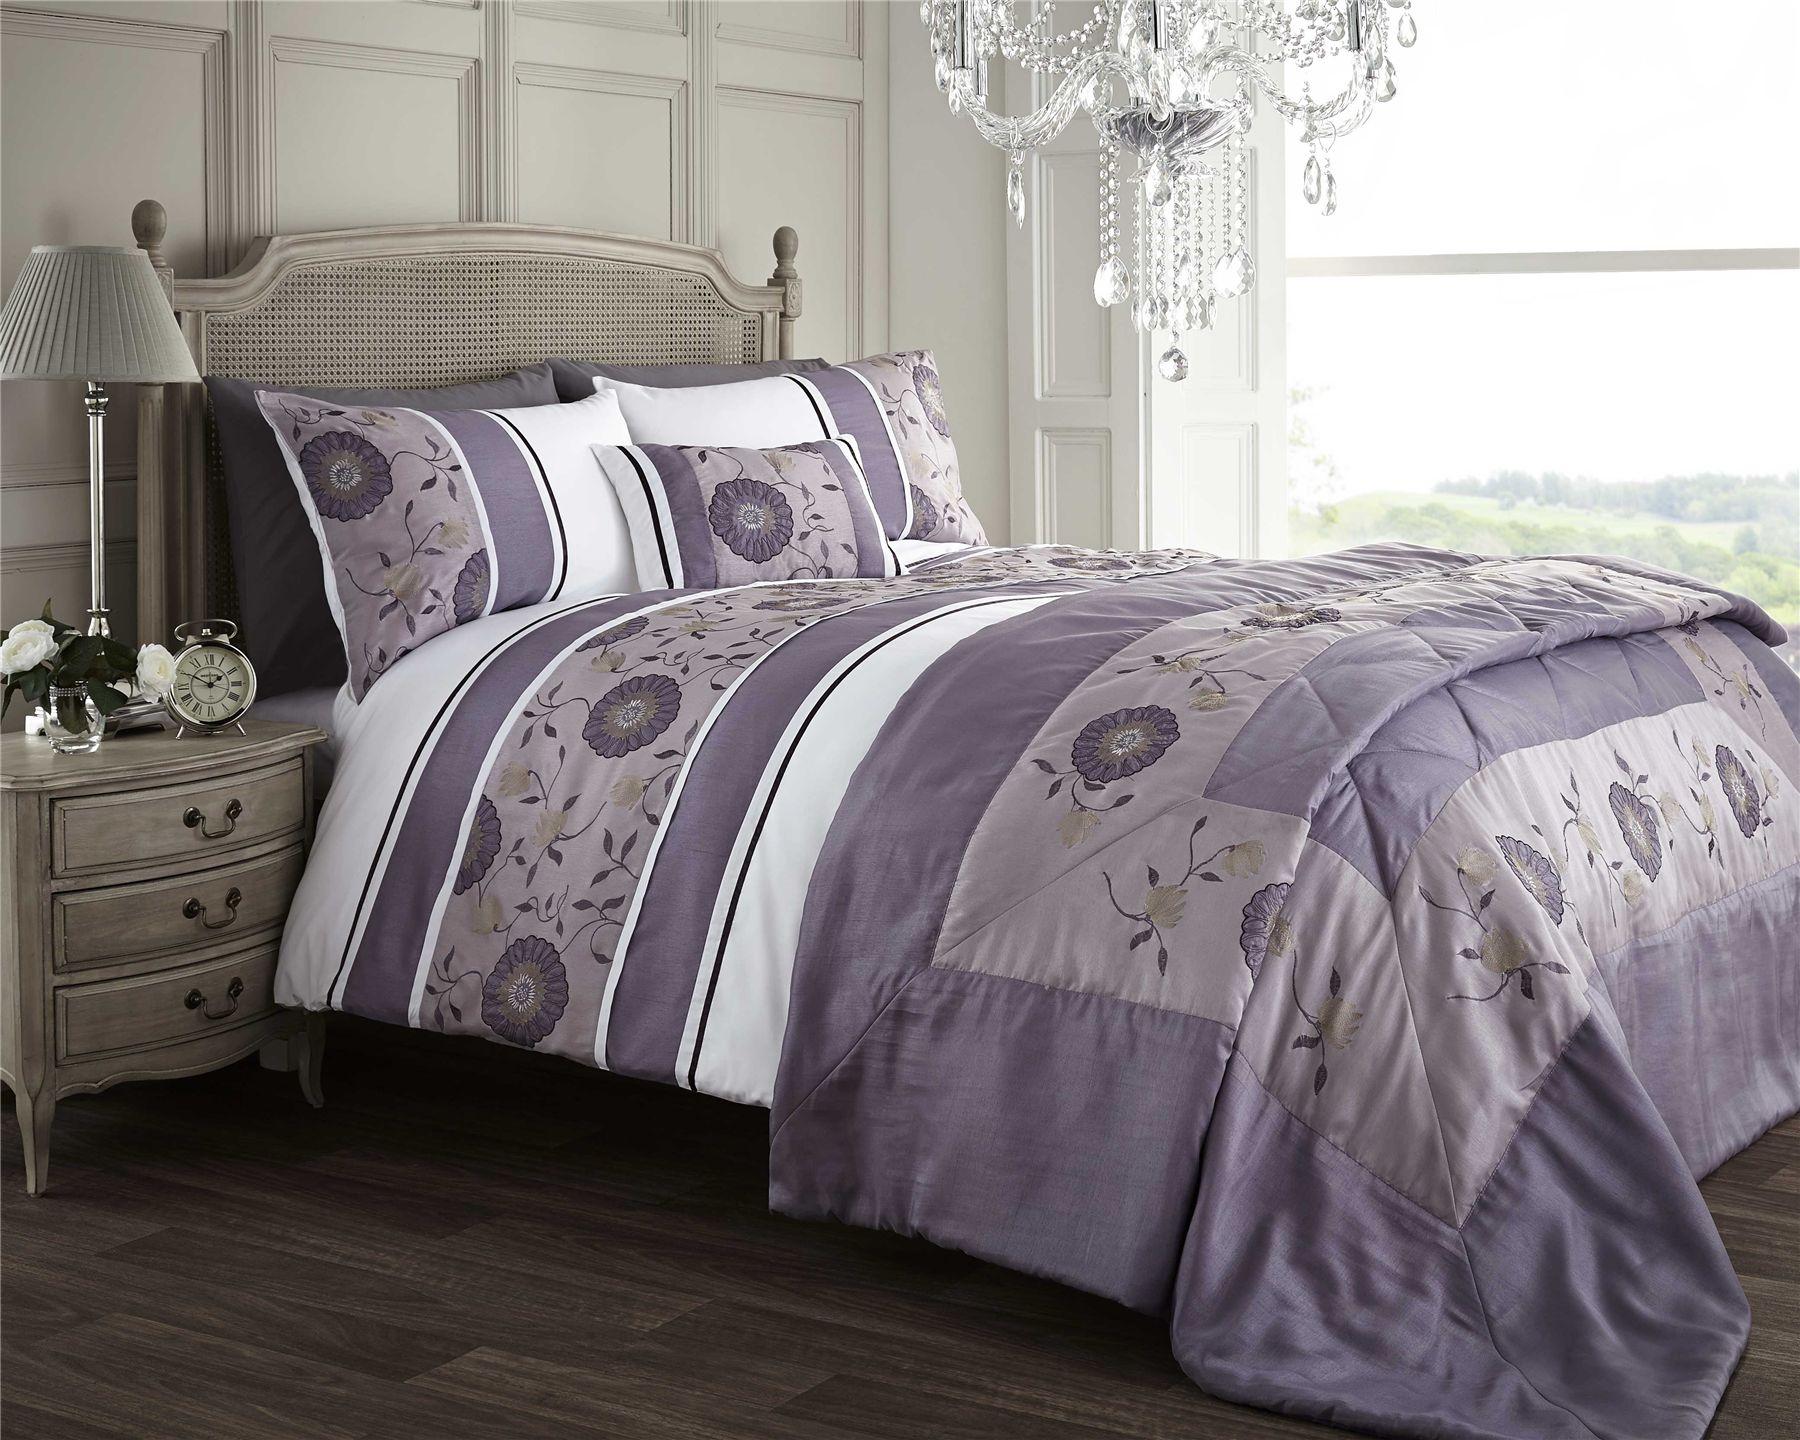 Floral Quilt Duvet Cover Amp Pillowcase Bedding Bed Sets